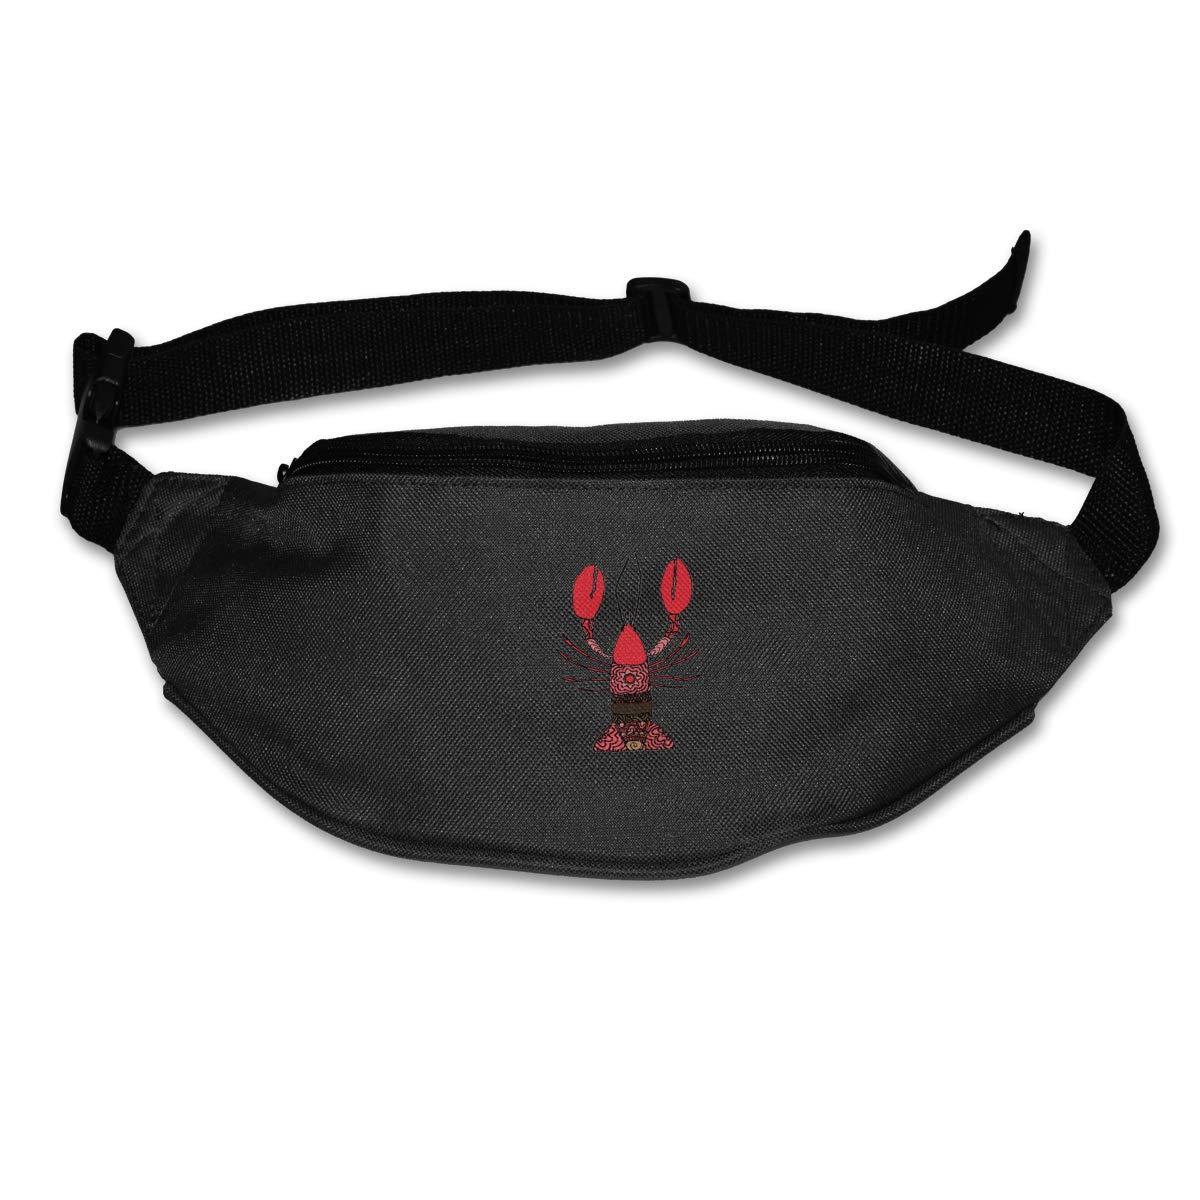 Interesting Lobster Sport Waist Packs Fanny Pack Adjustable For Hike